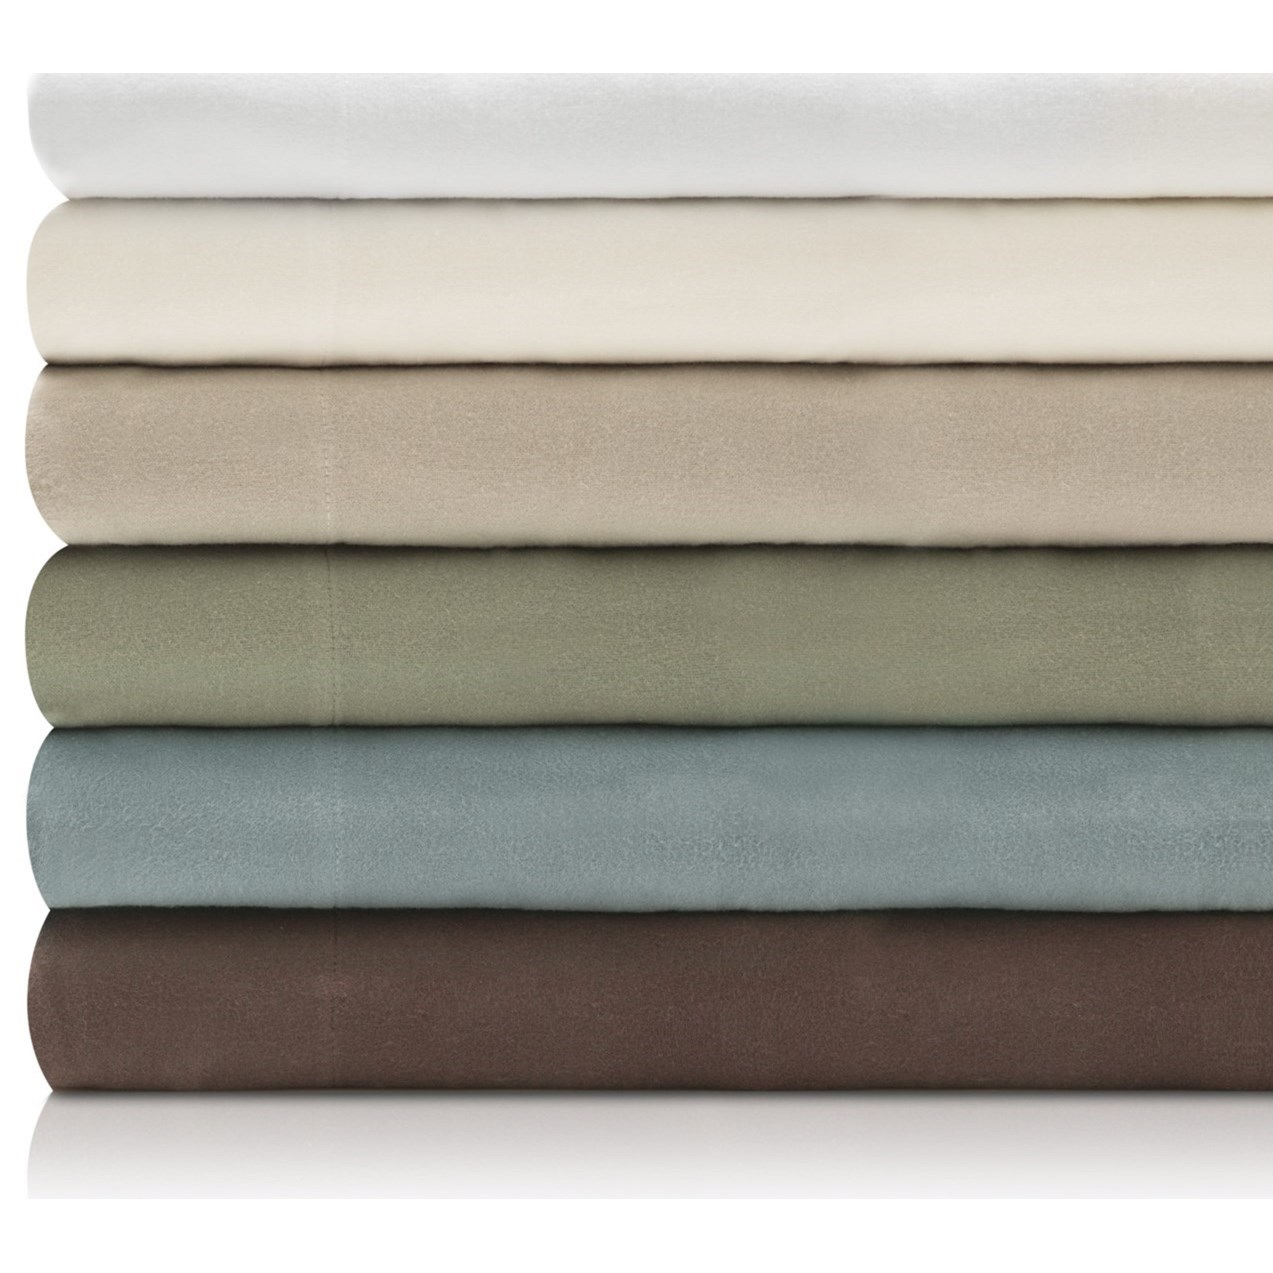 Malouf Portuguese Flannel Twin XL Woven™ Portuguese Flannel Sheet Set - Item Number: WO19TXCOFS